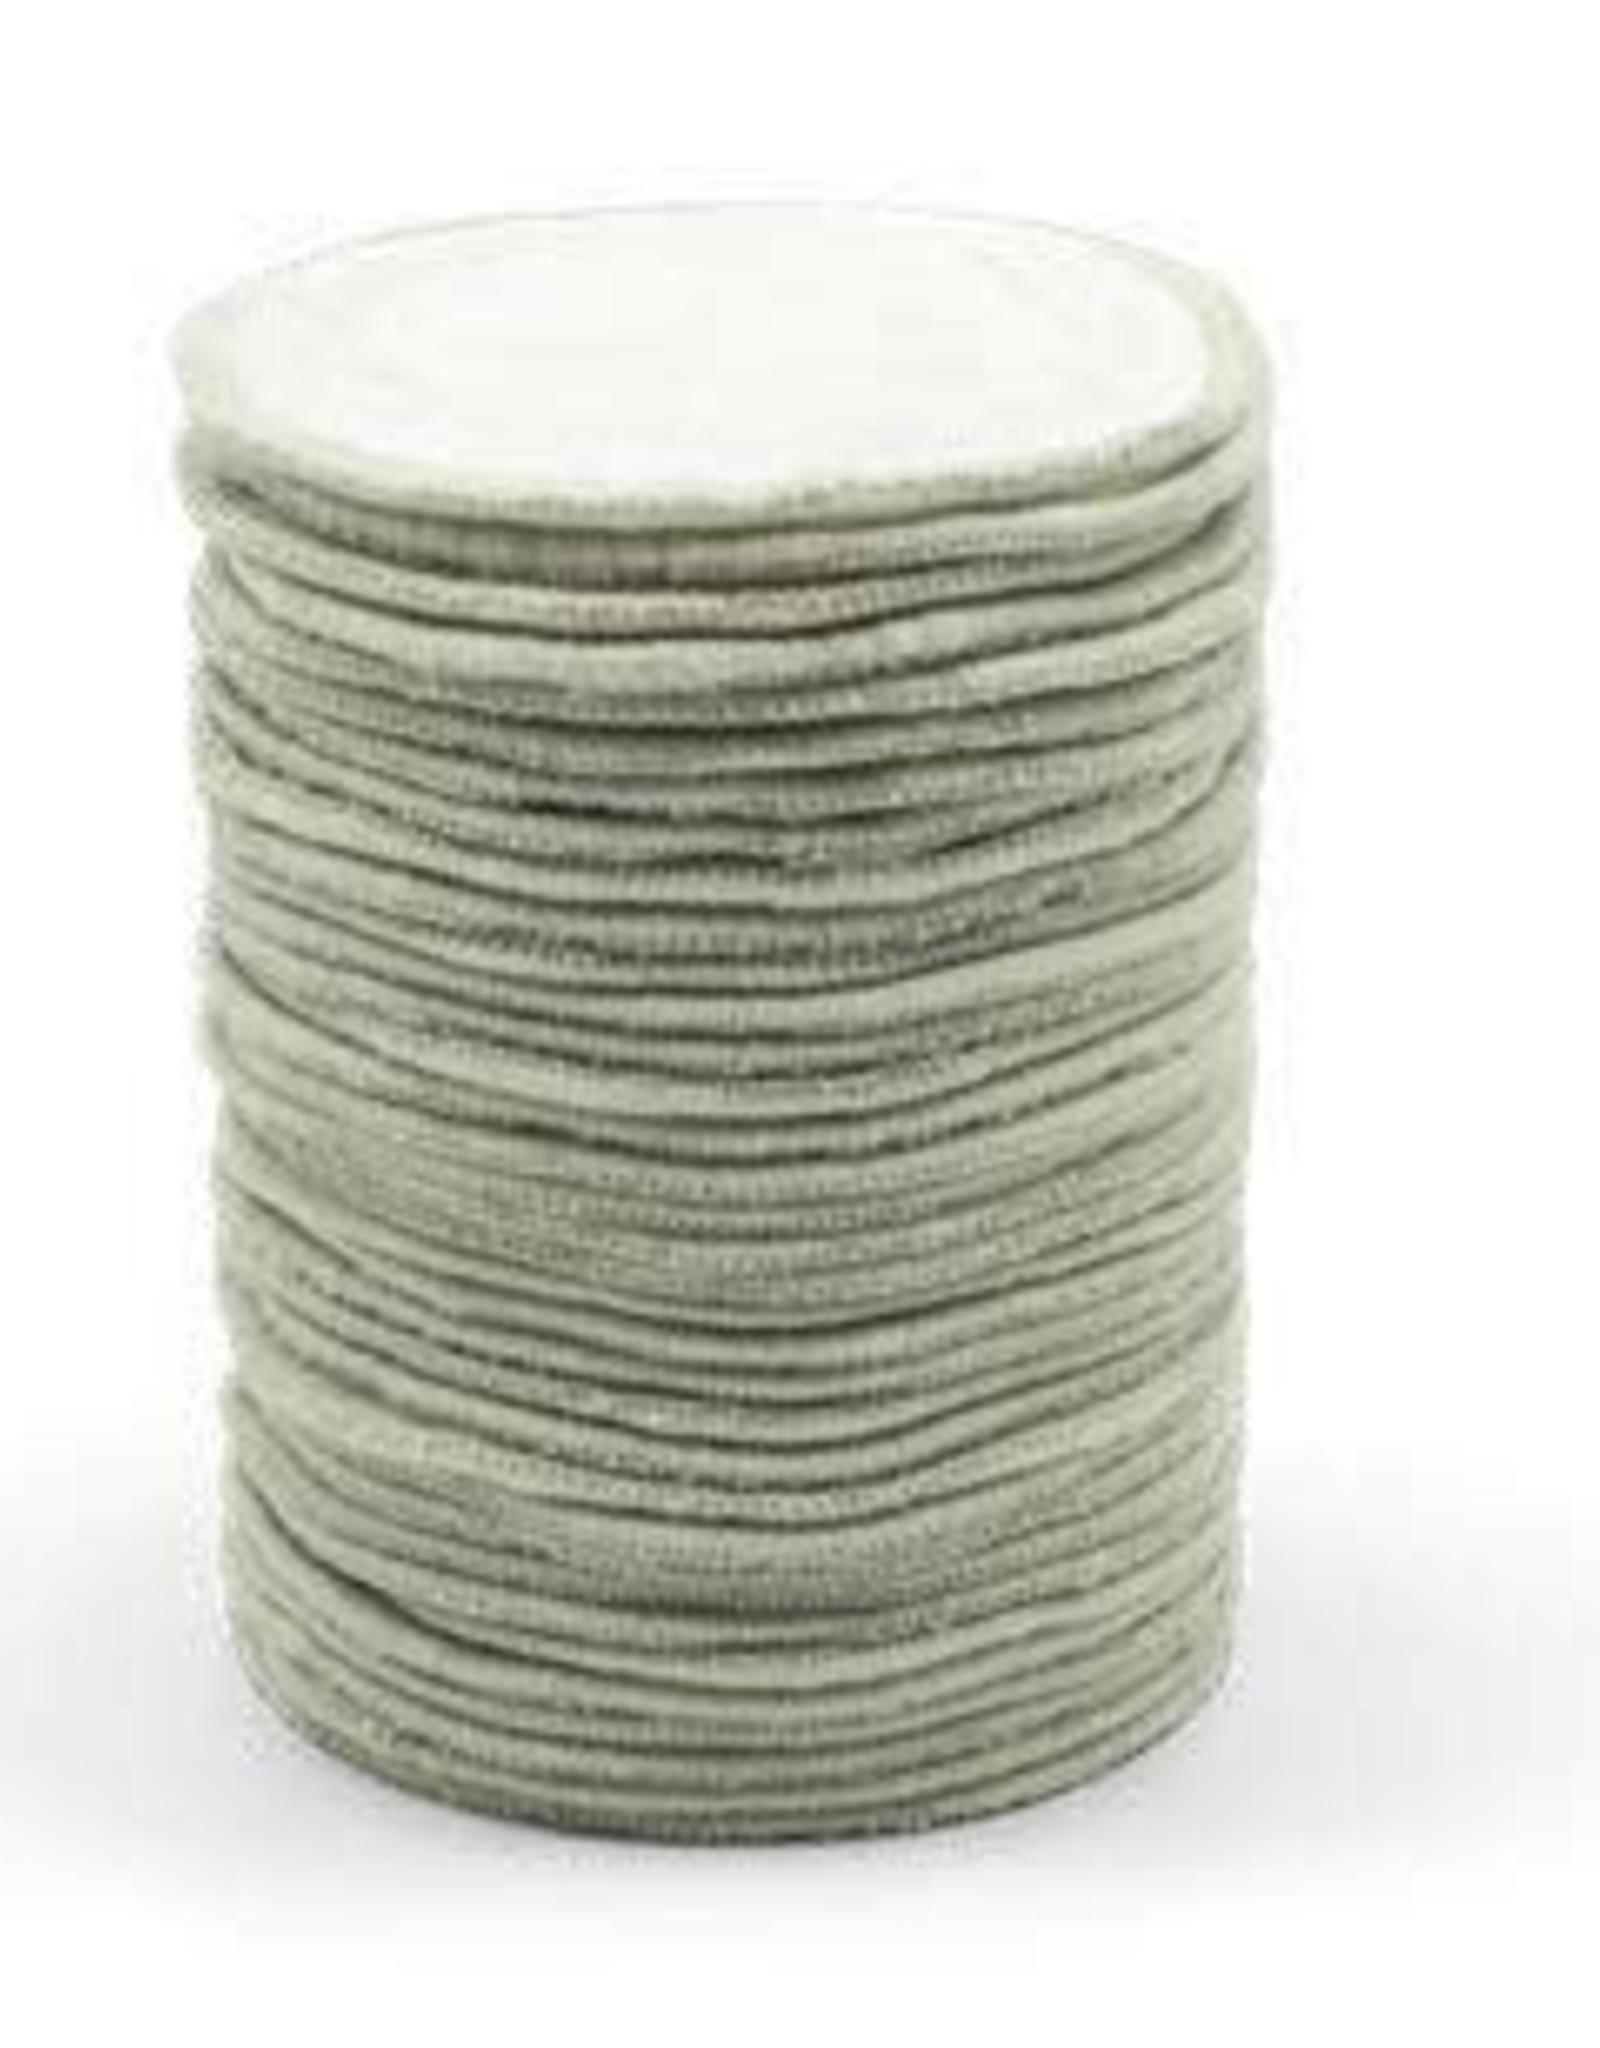 Bambaw Bambaw fluweelzacht herbruikbaar wattenschijfje - per 1 stuk